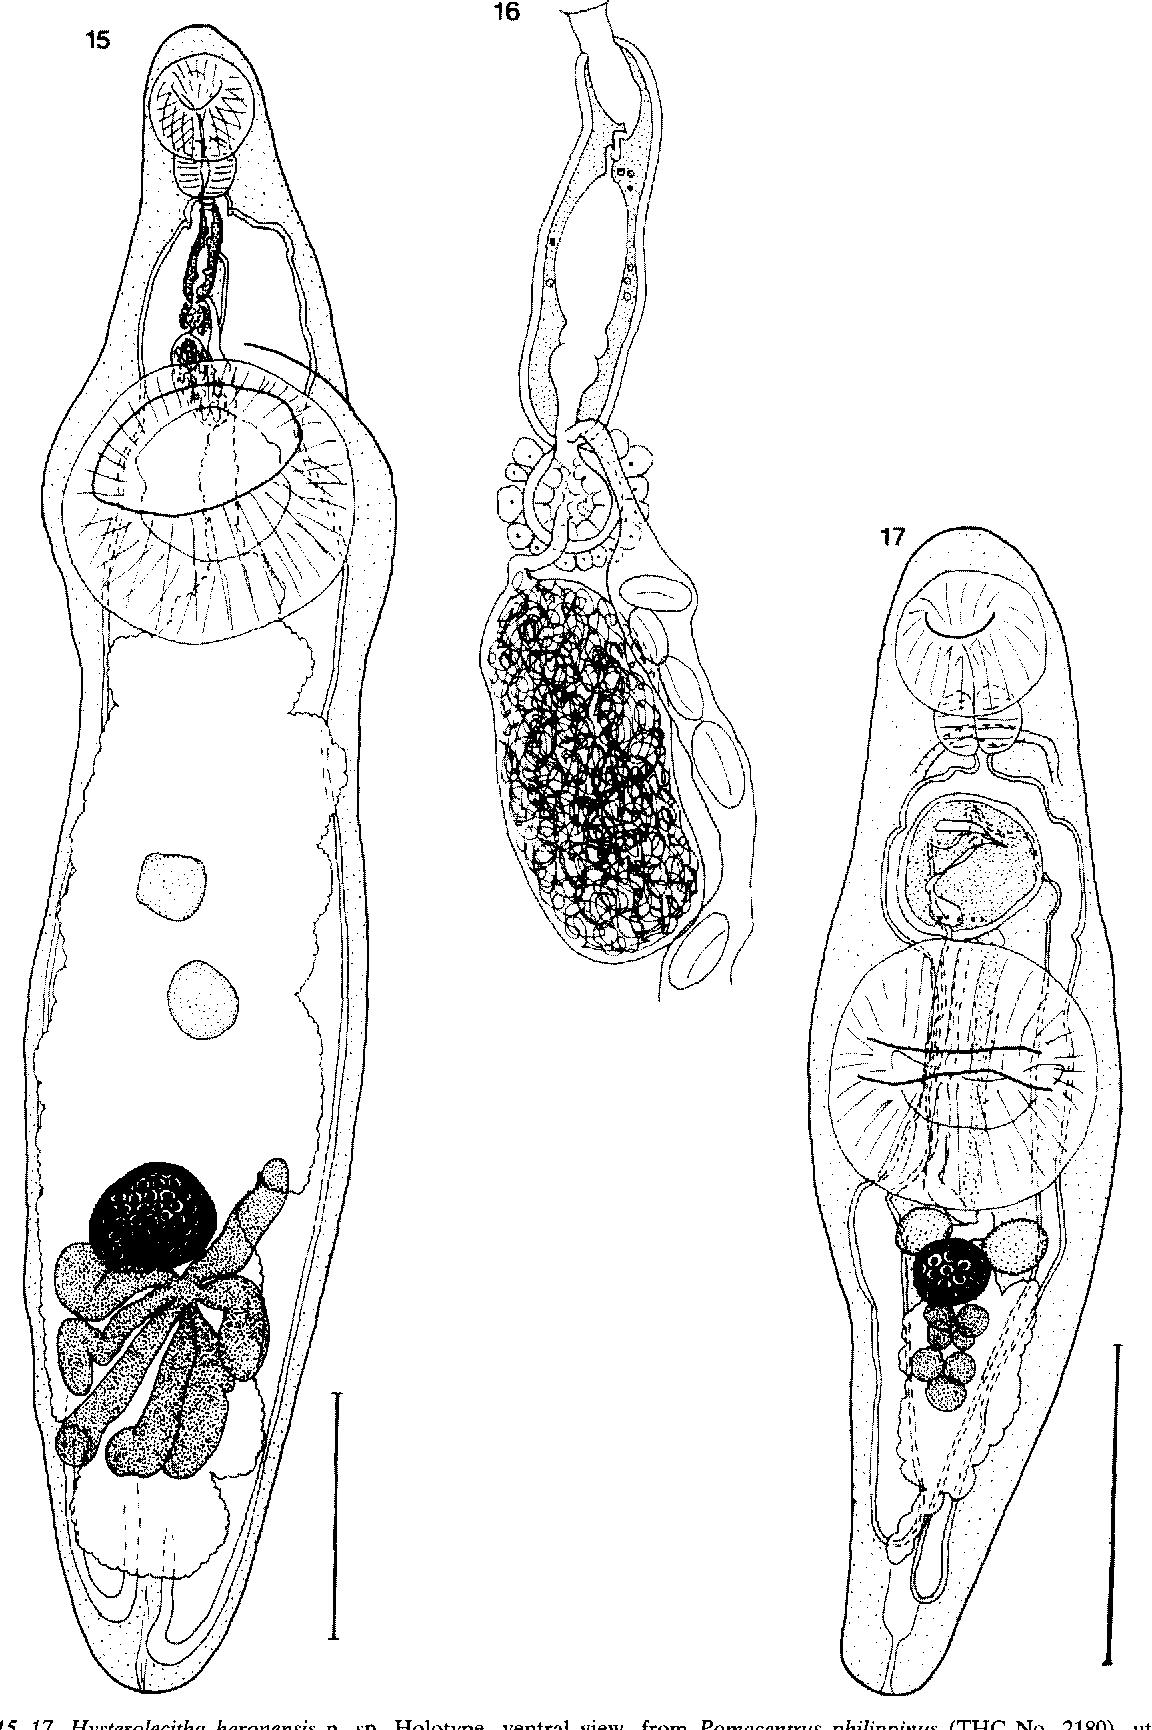 figure 15-17